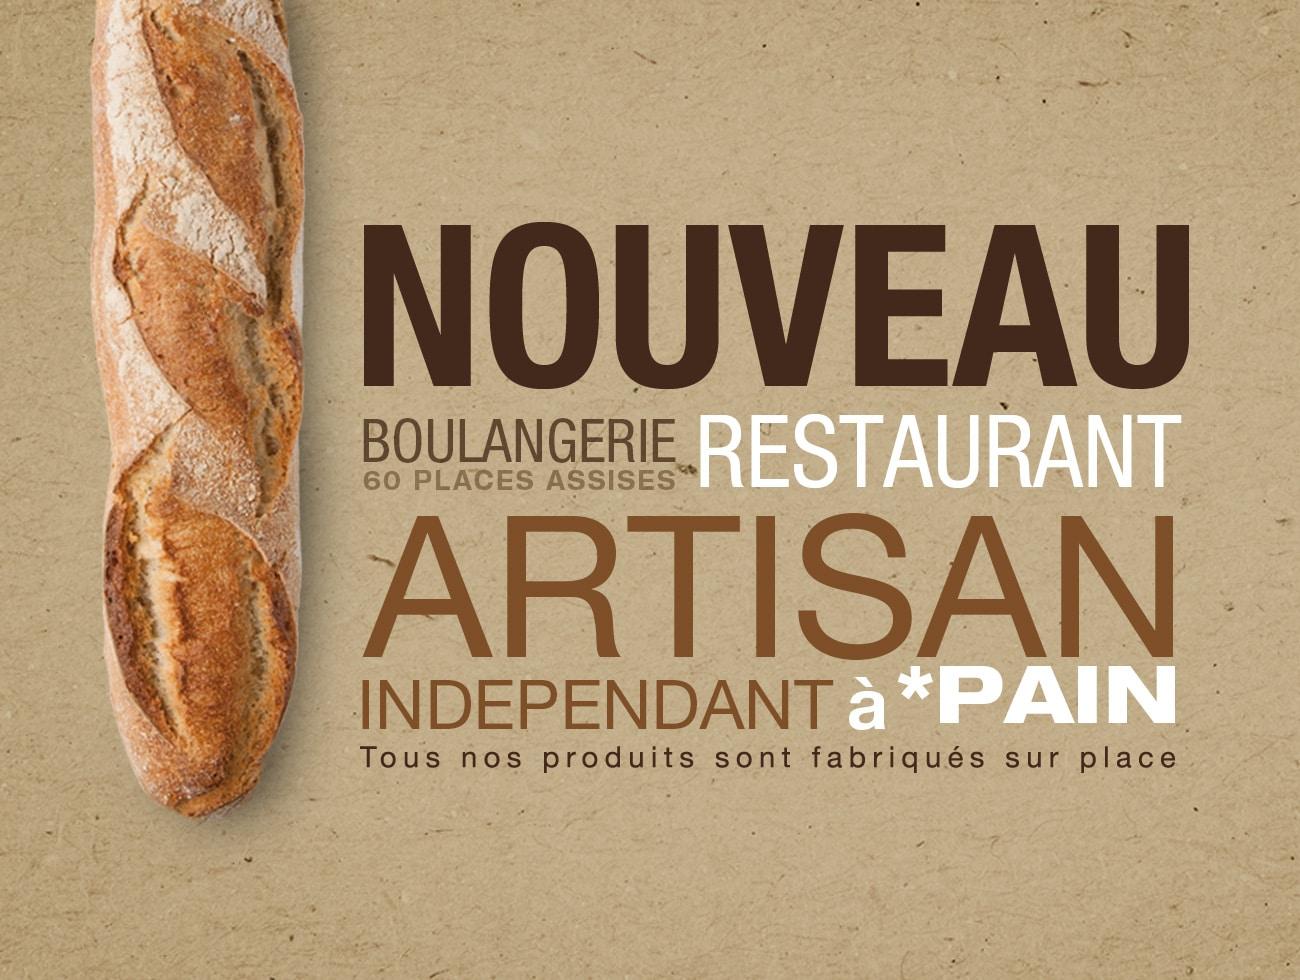 3-bara-boulangerie-positionnement-identite-visuelle-marketing-communication-bretagne-lorient